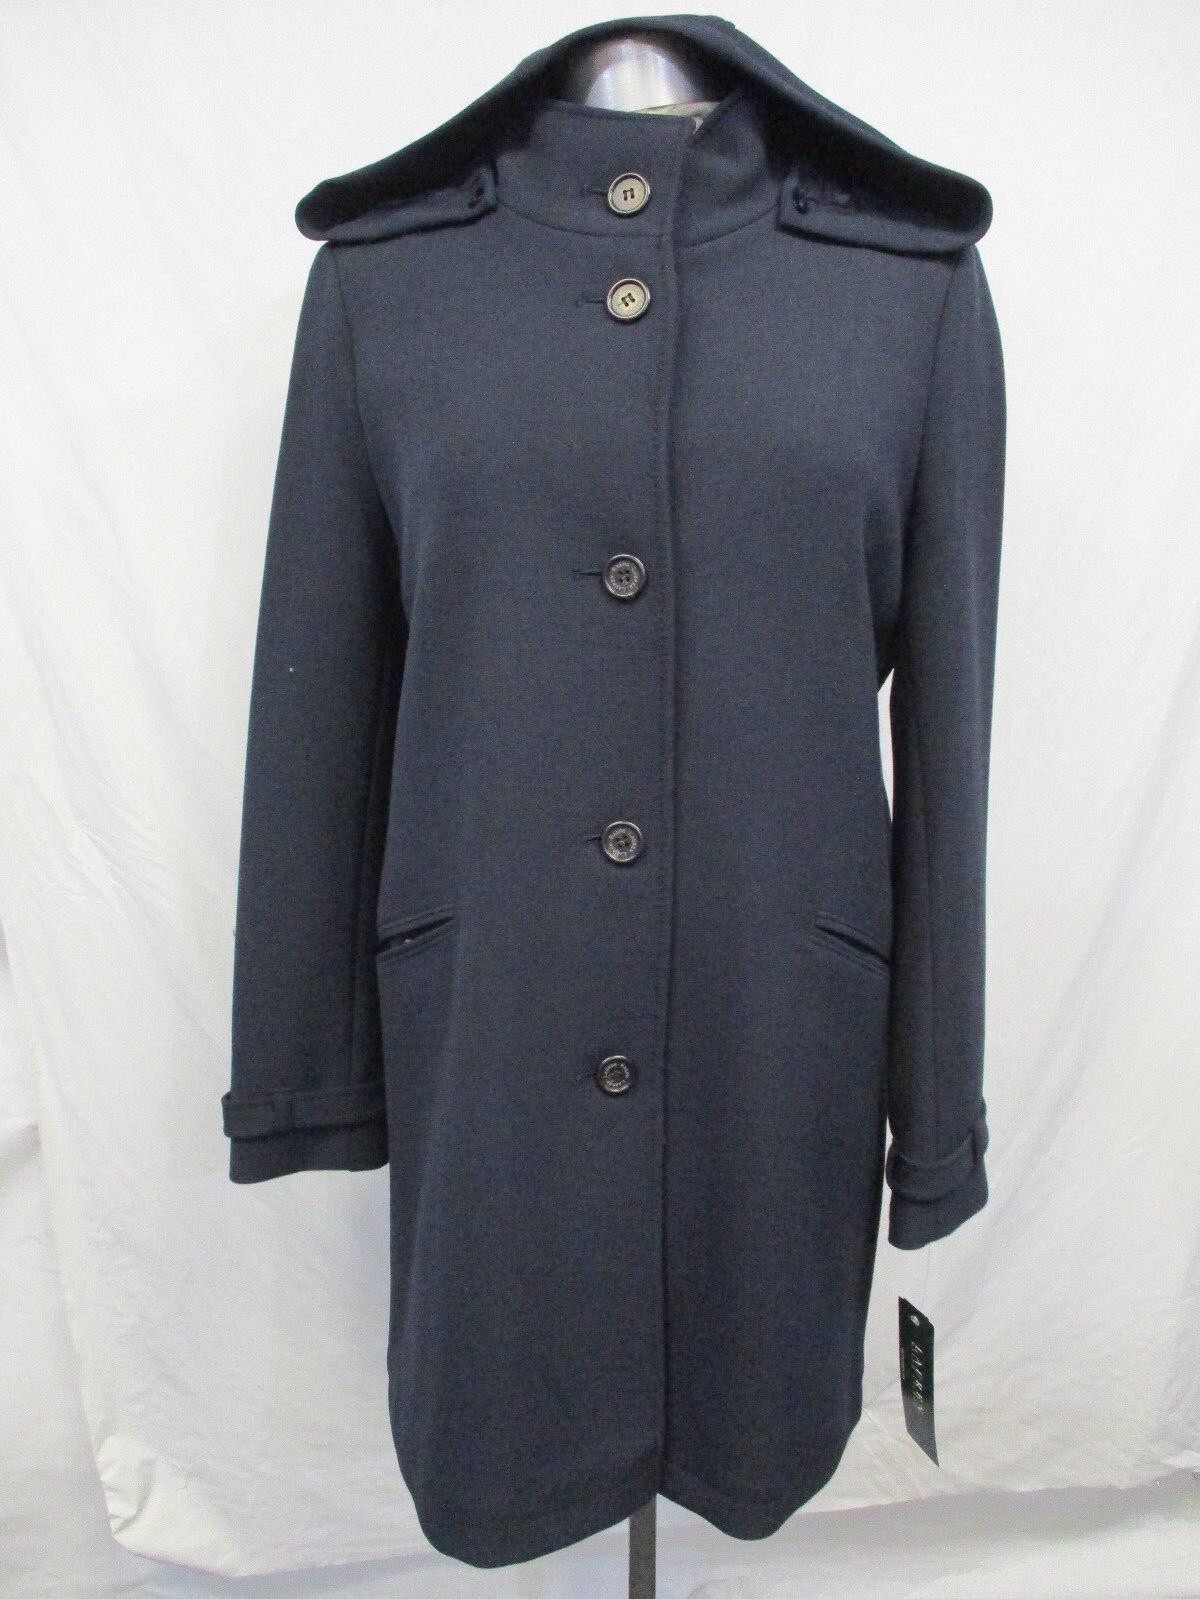 Ralph Lauren Women's Size 8 Size 10 Navy Polyester Trench Coat RETAIL